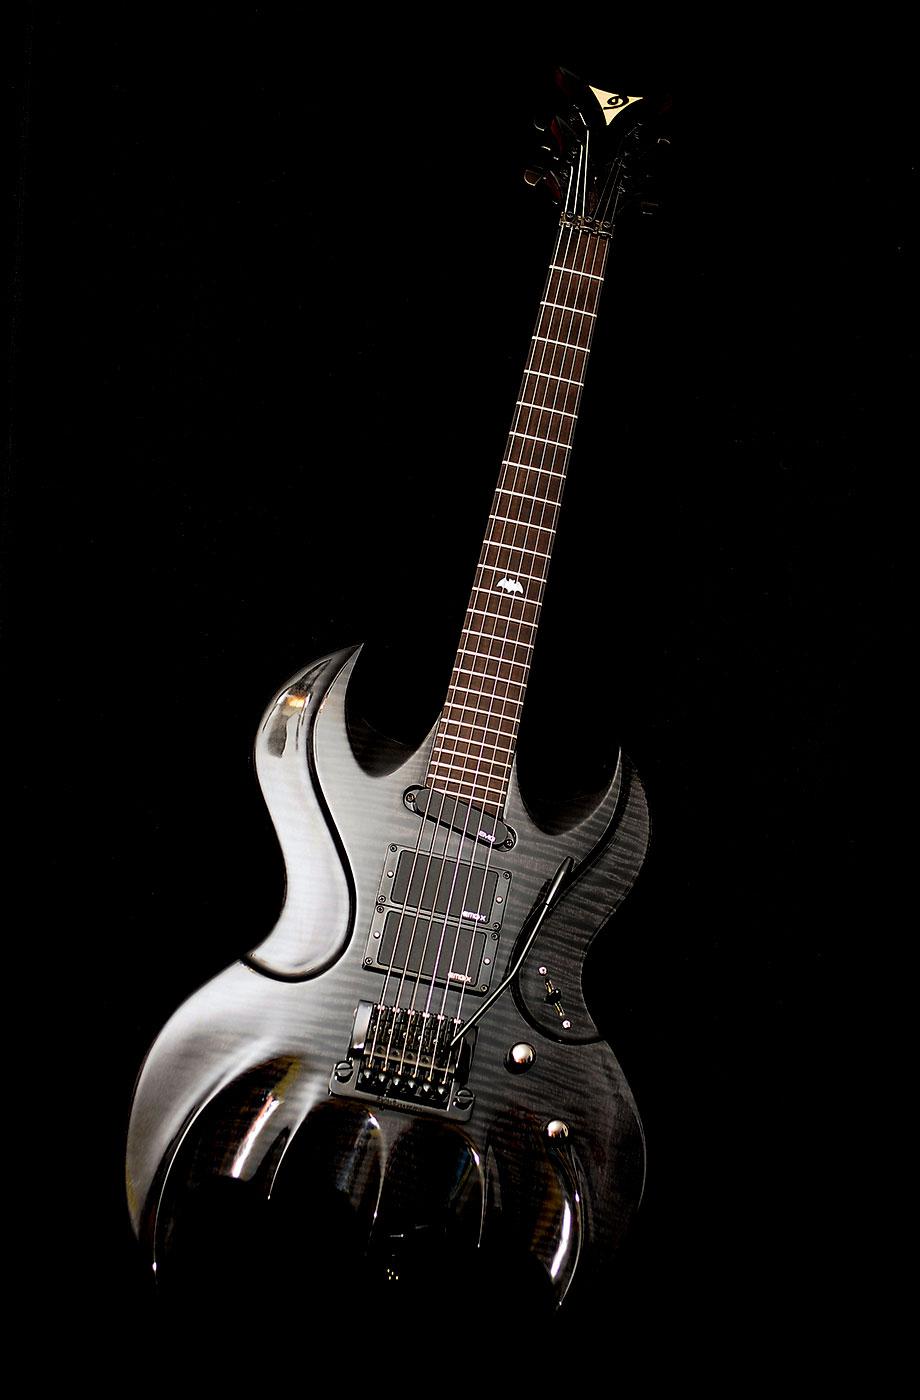 bat_guitar_danou